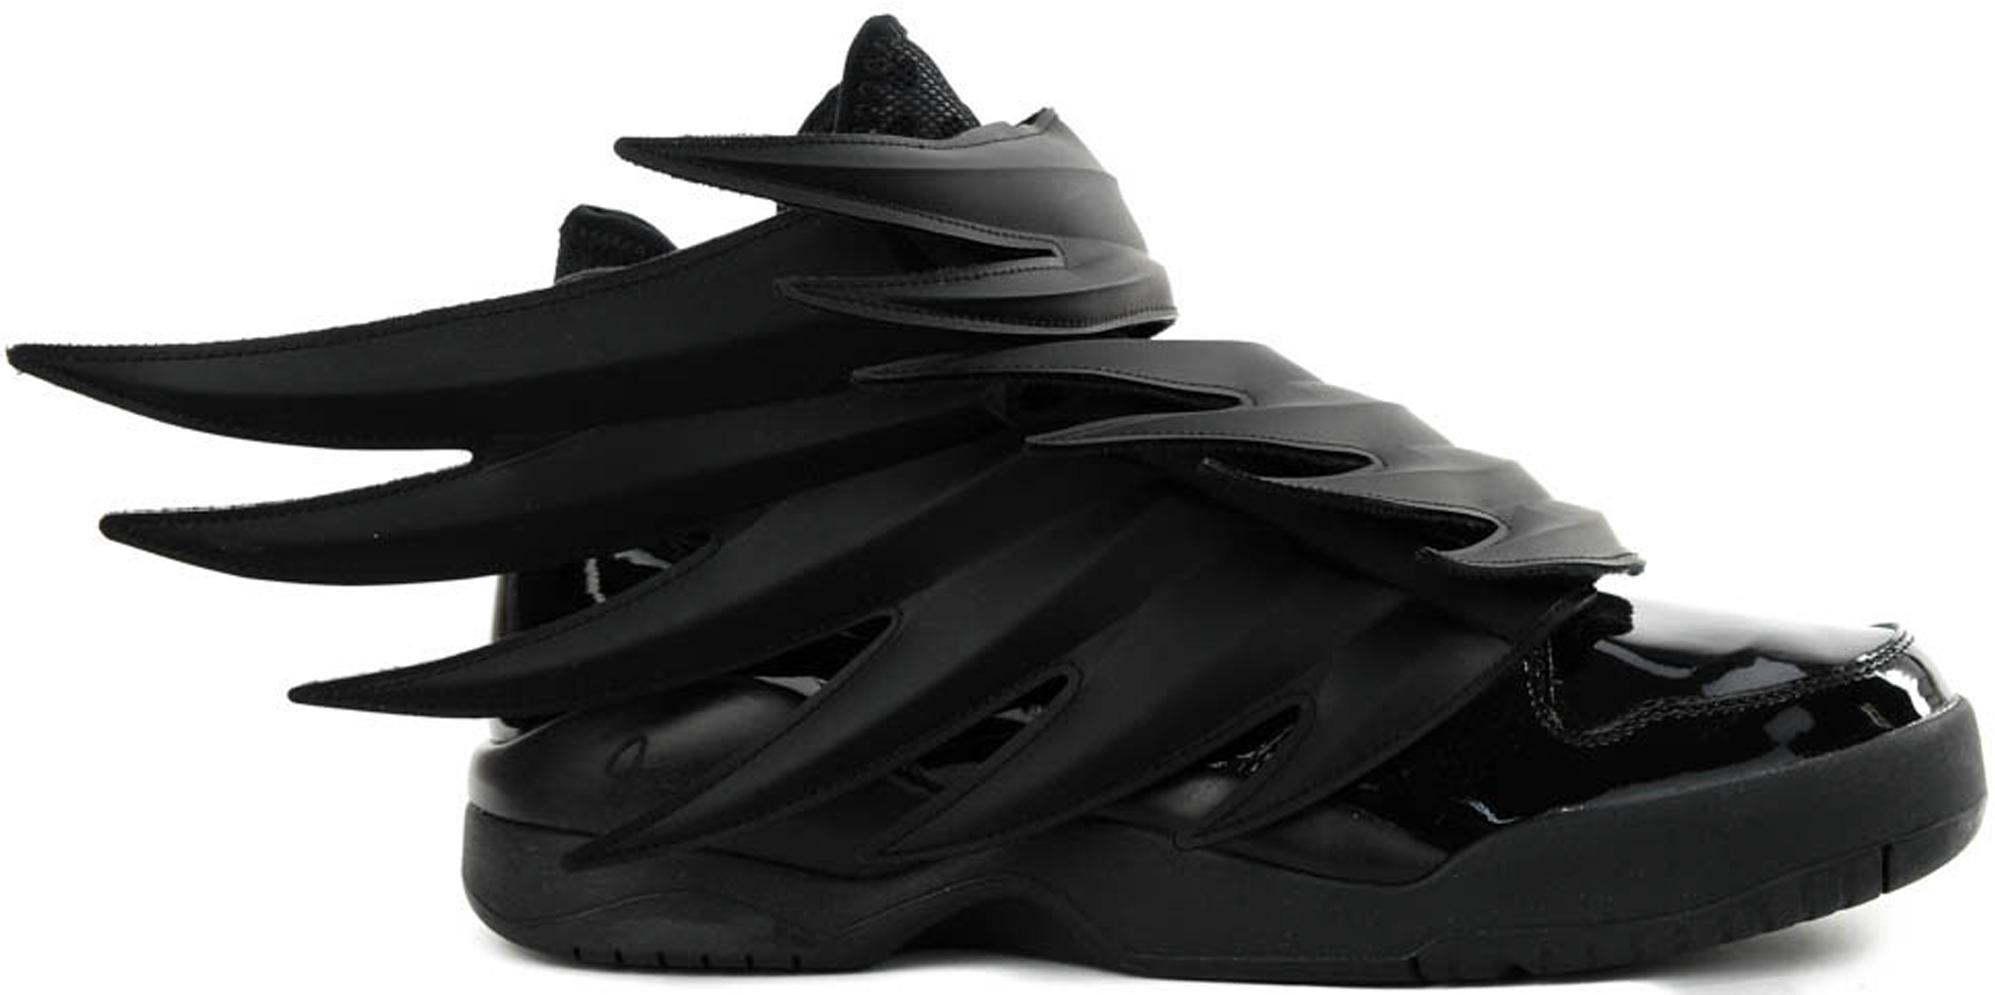 adidas Jeremy Scott Wings 3.0 Dark Knight